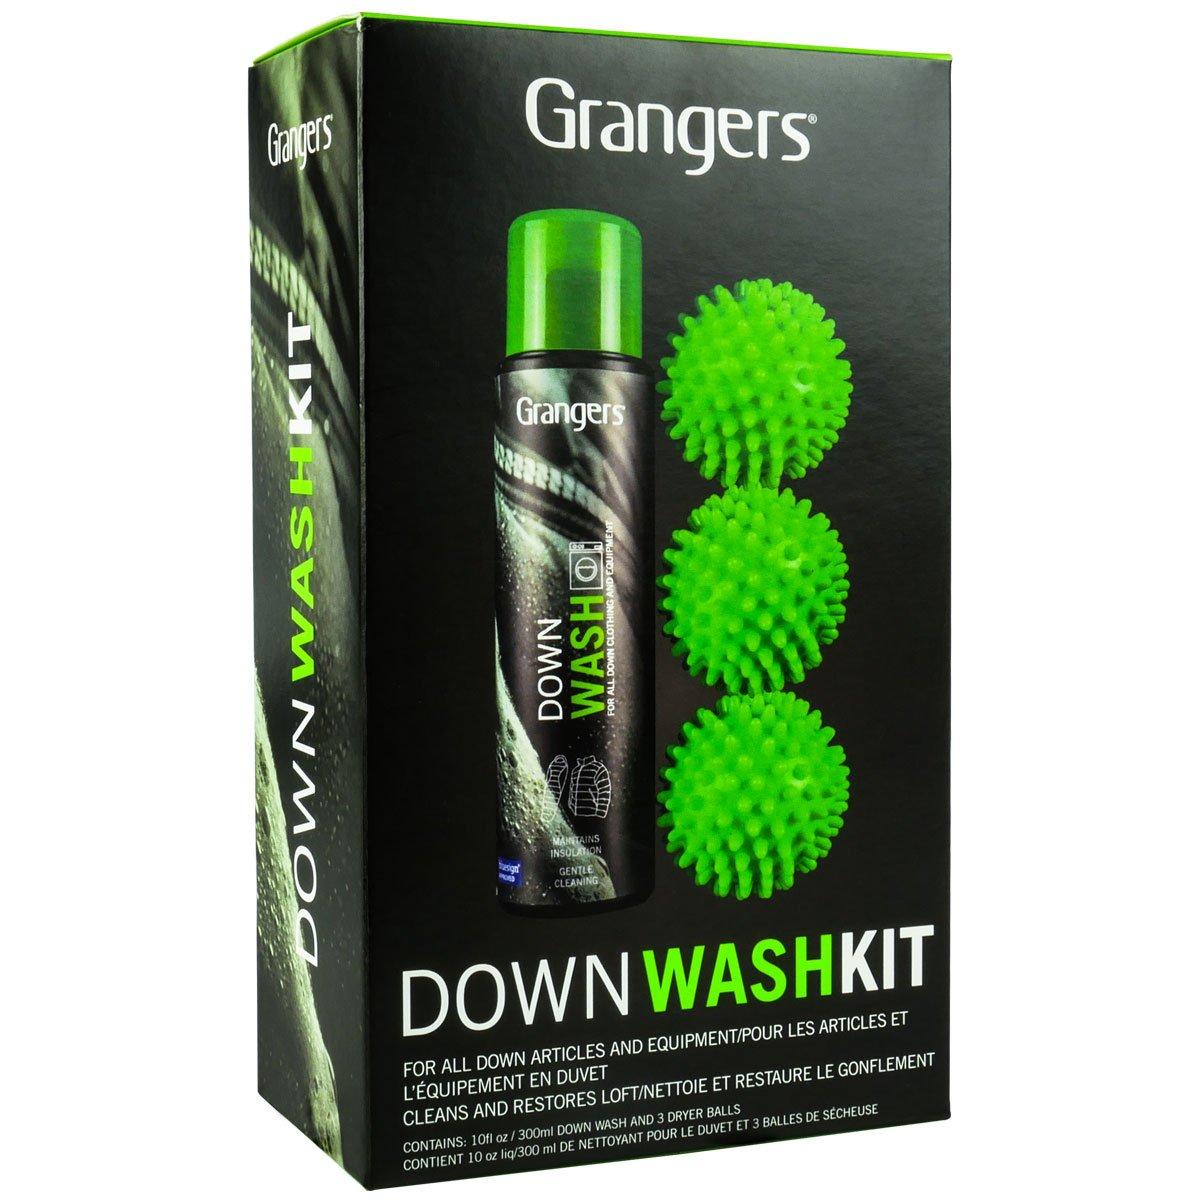 Grangers_down_wash_kit_1600x1600